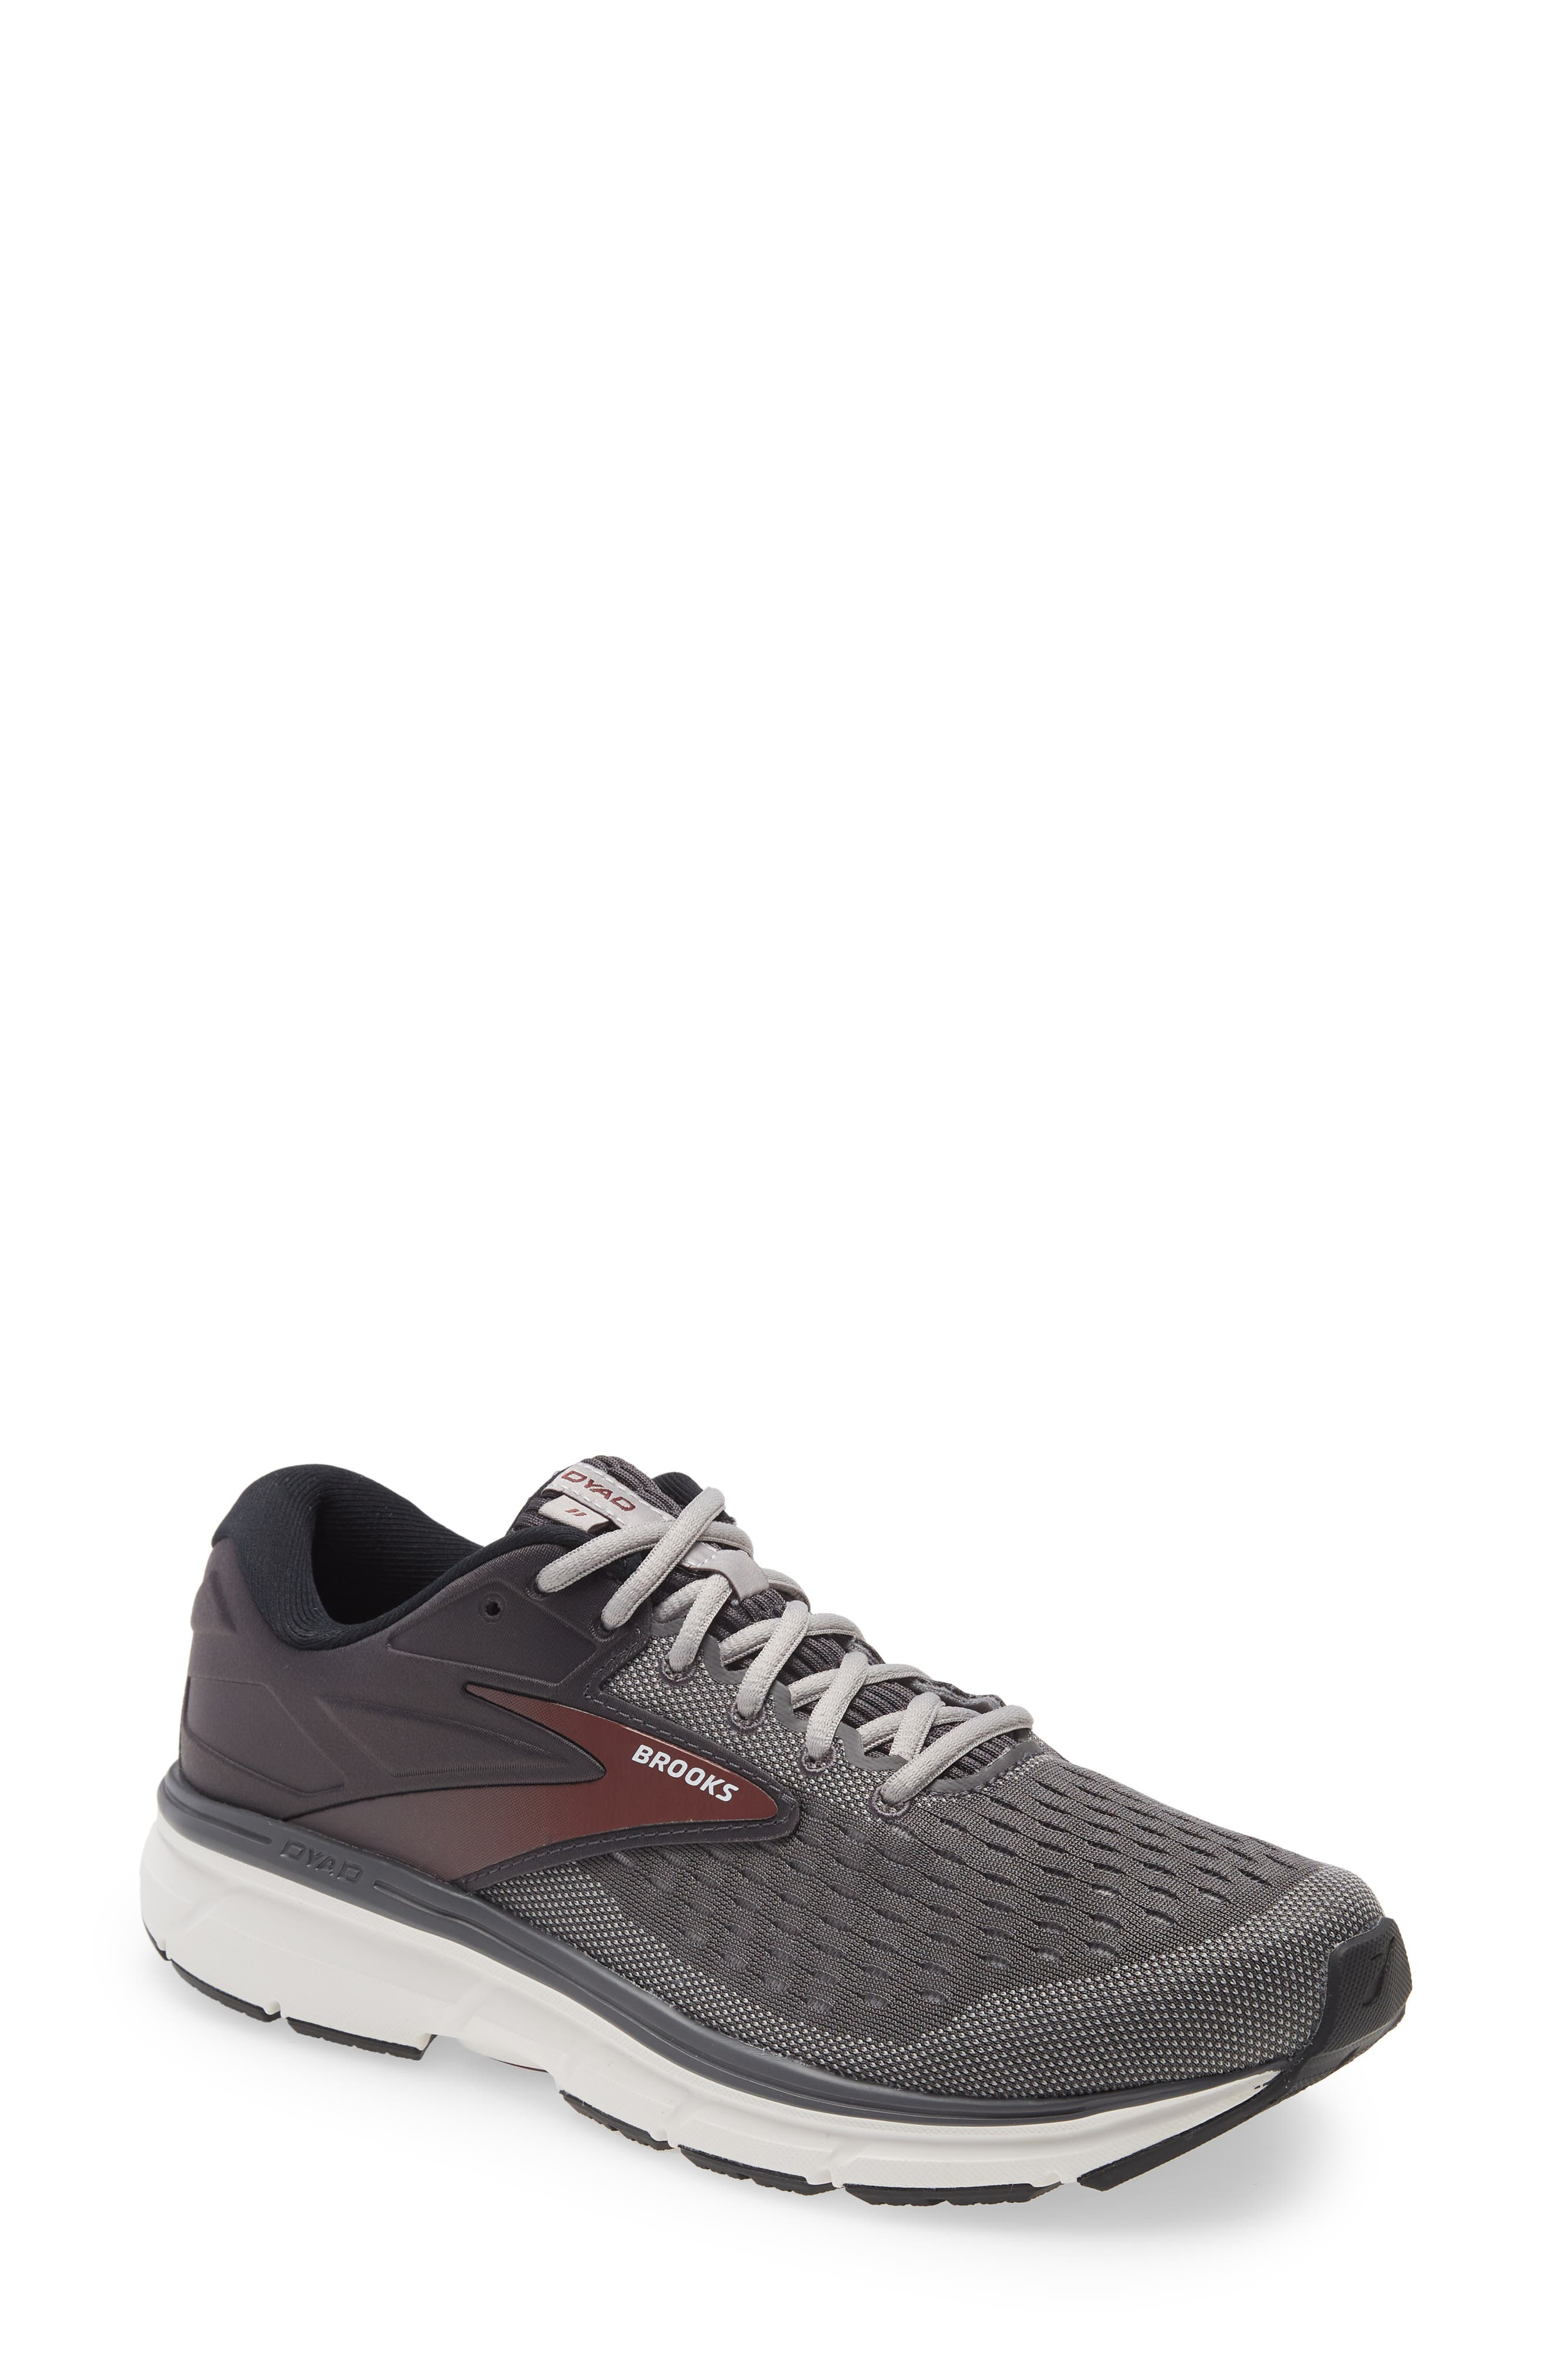 Dyad 11 Running Shoe